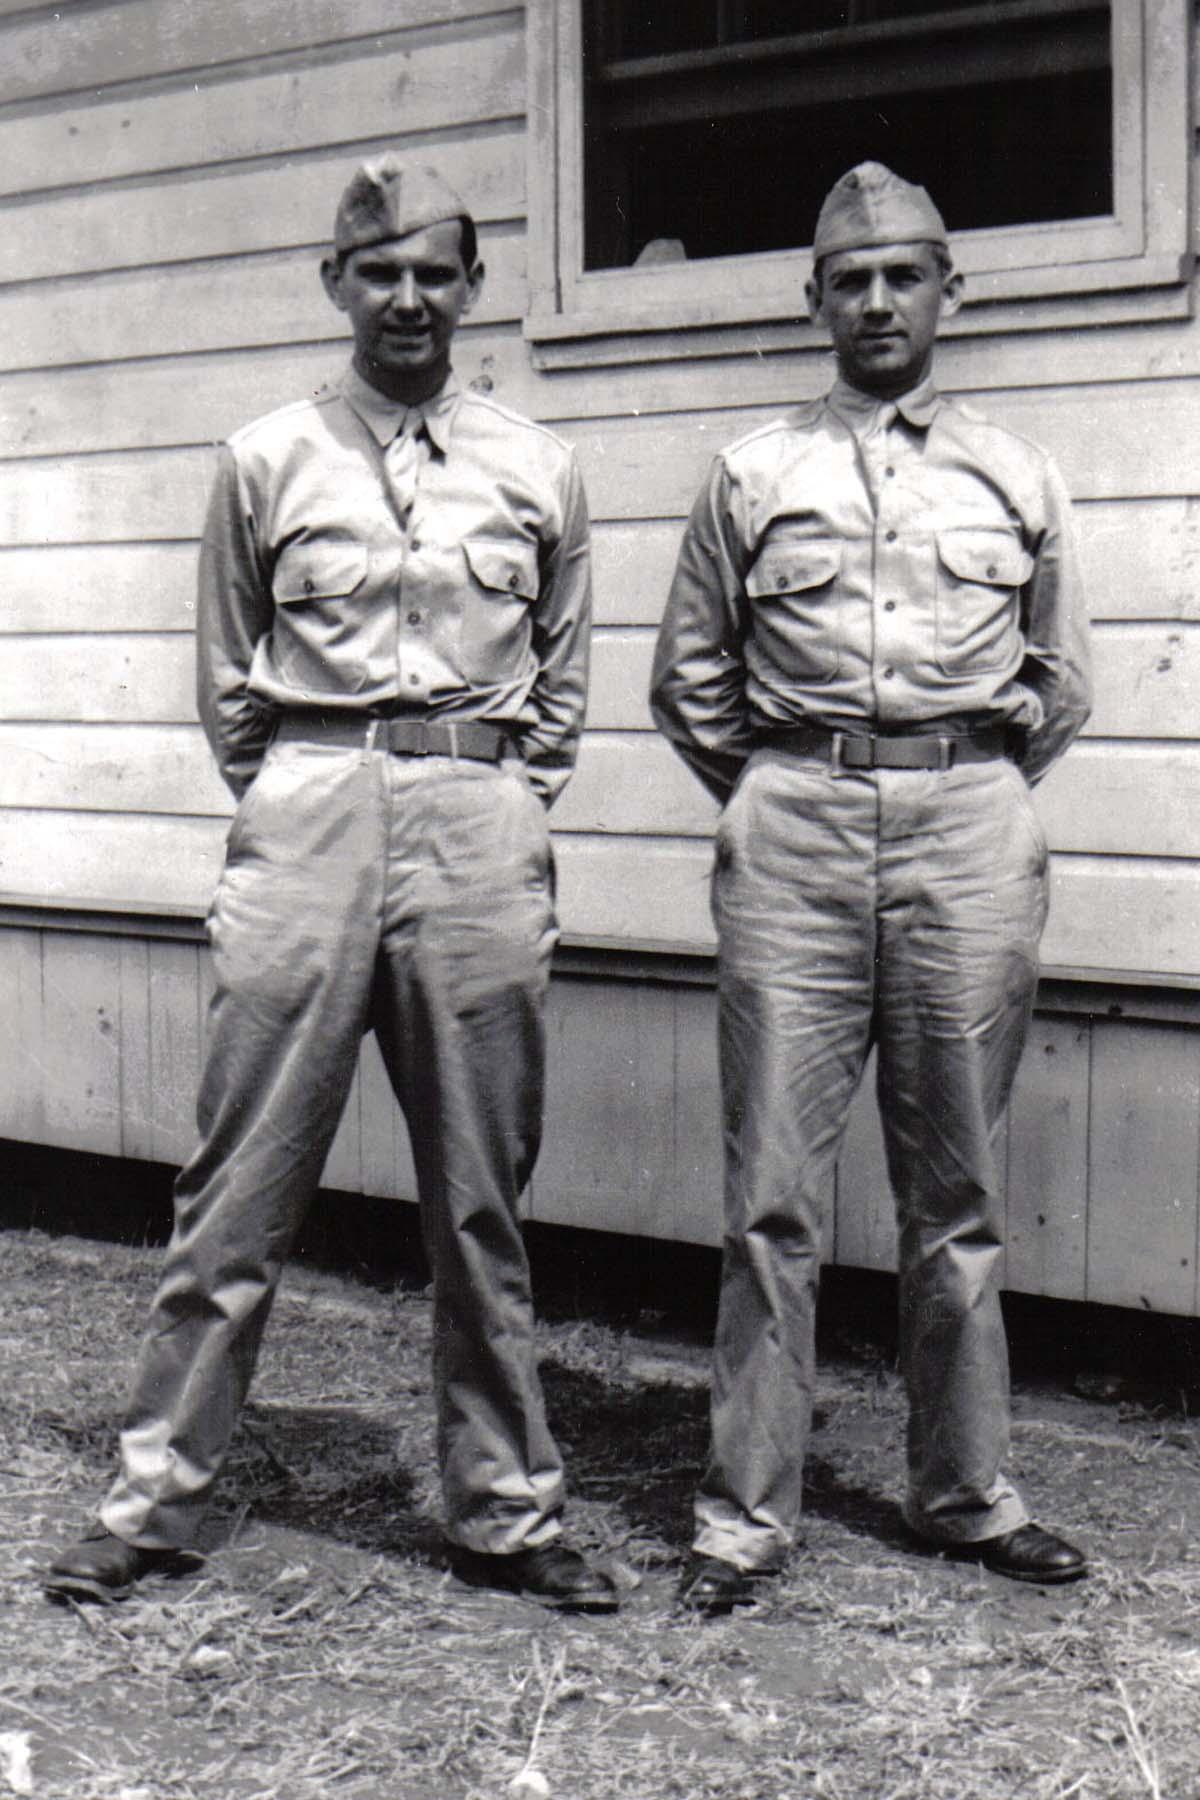 A01 Ft_ Leonard Wood_ MO - Lou Murrin and Tom Fallen - August 1942